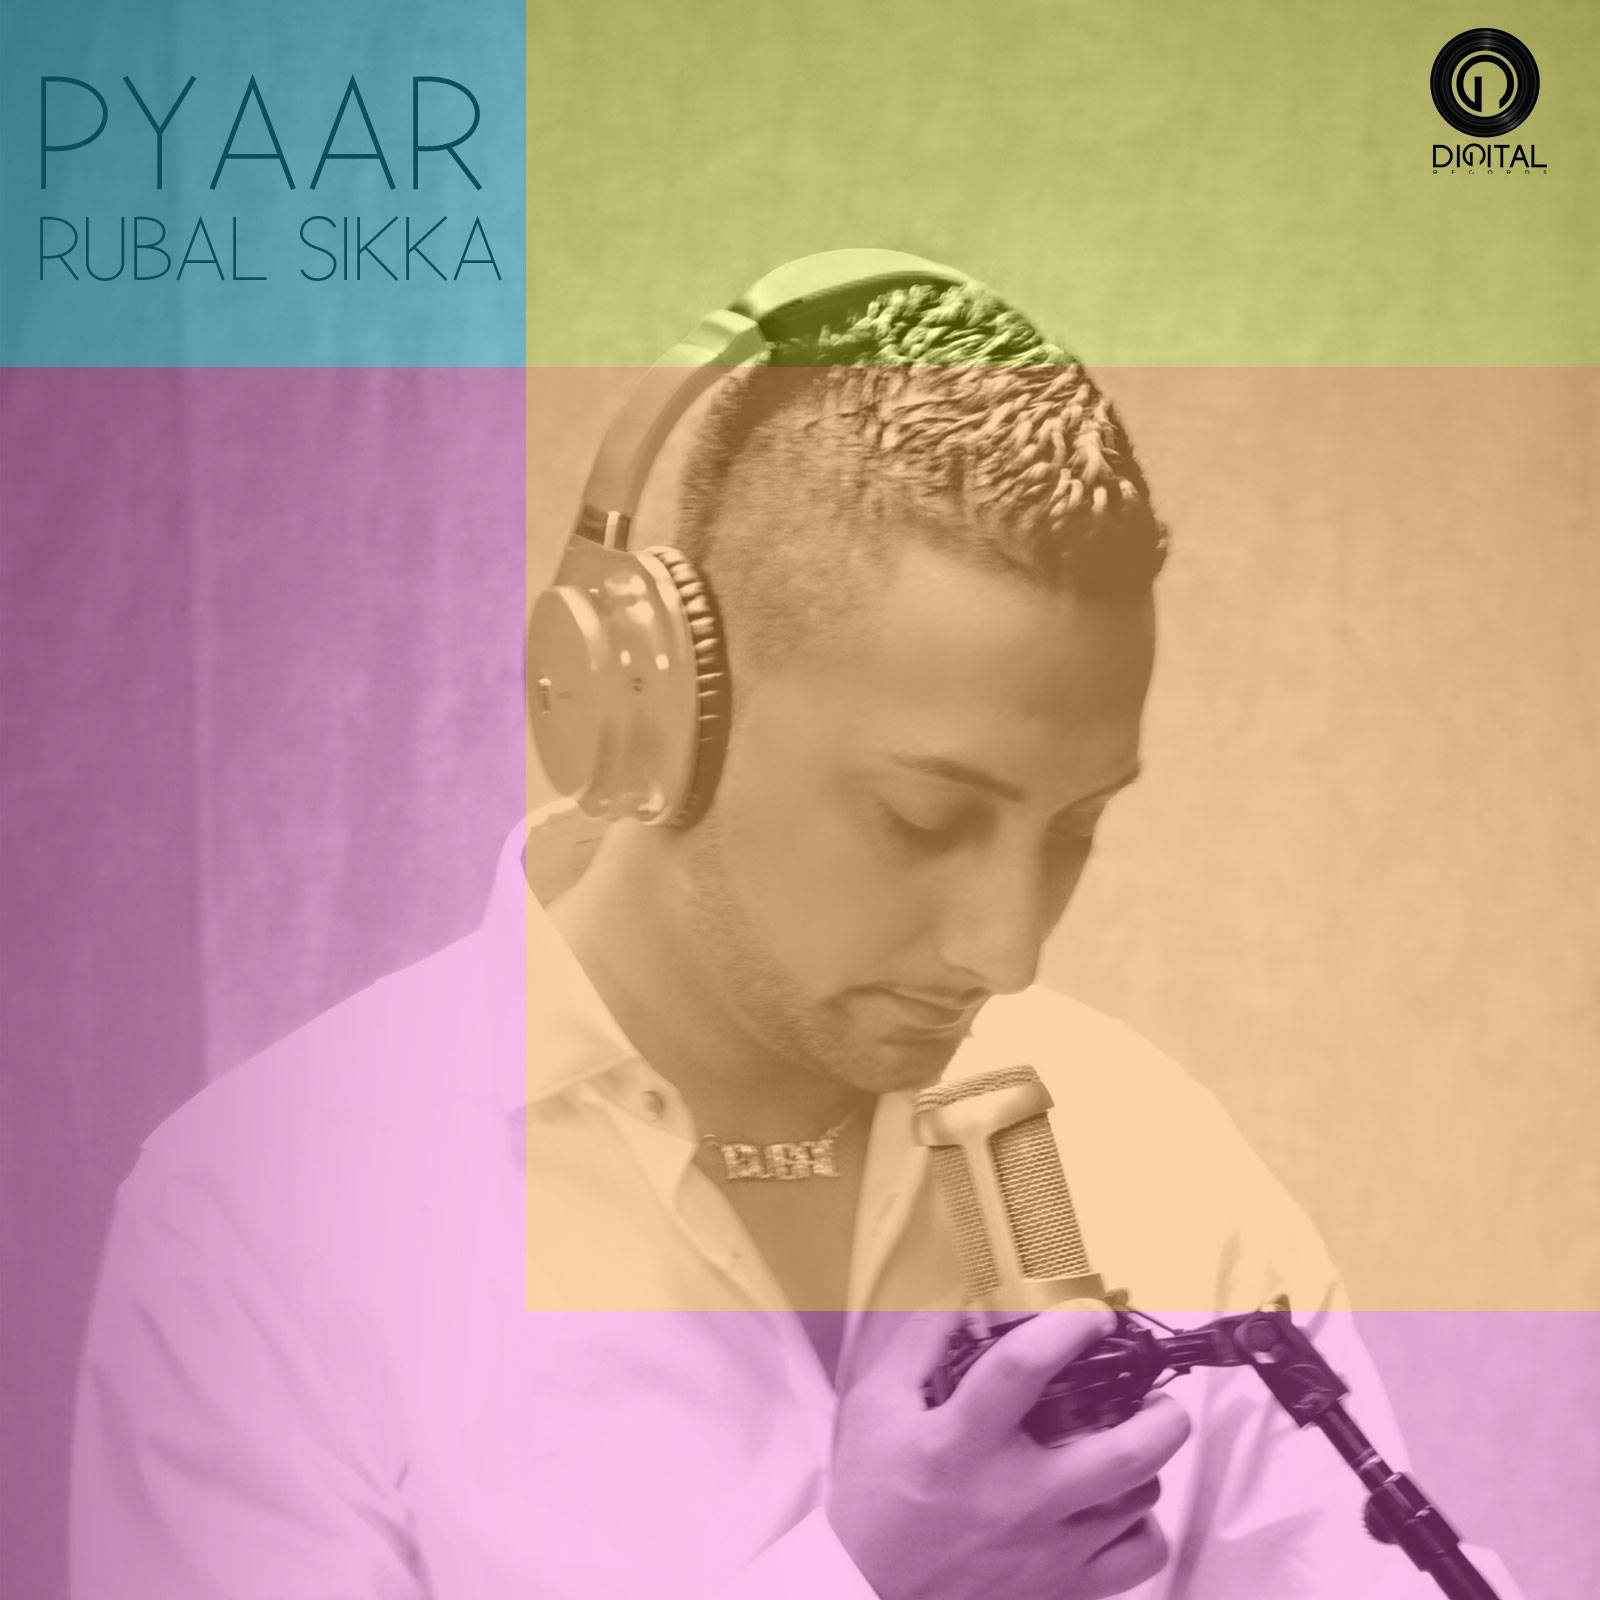 "Rubal Sikka ft Sir Aah Single ""Pyaar"" Out Now"